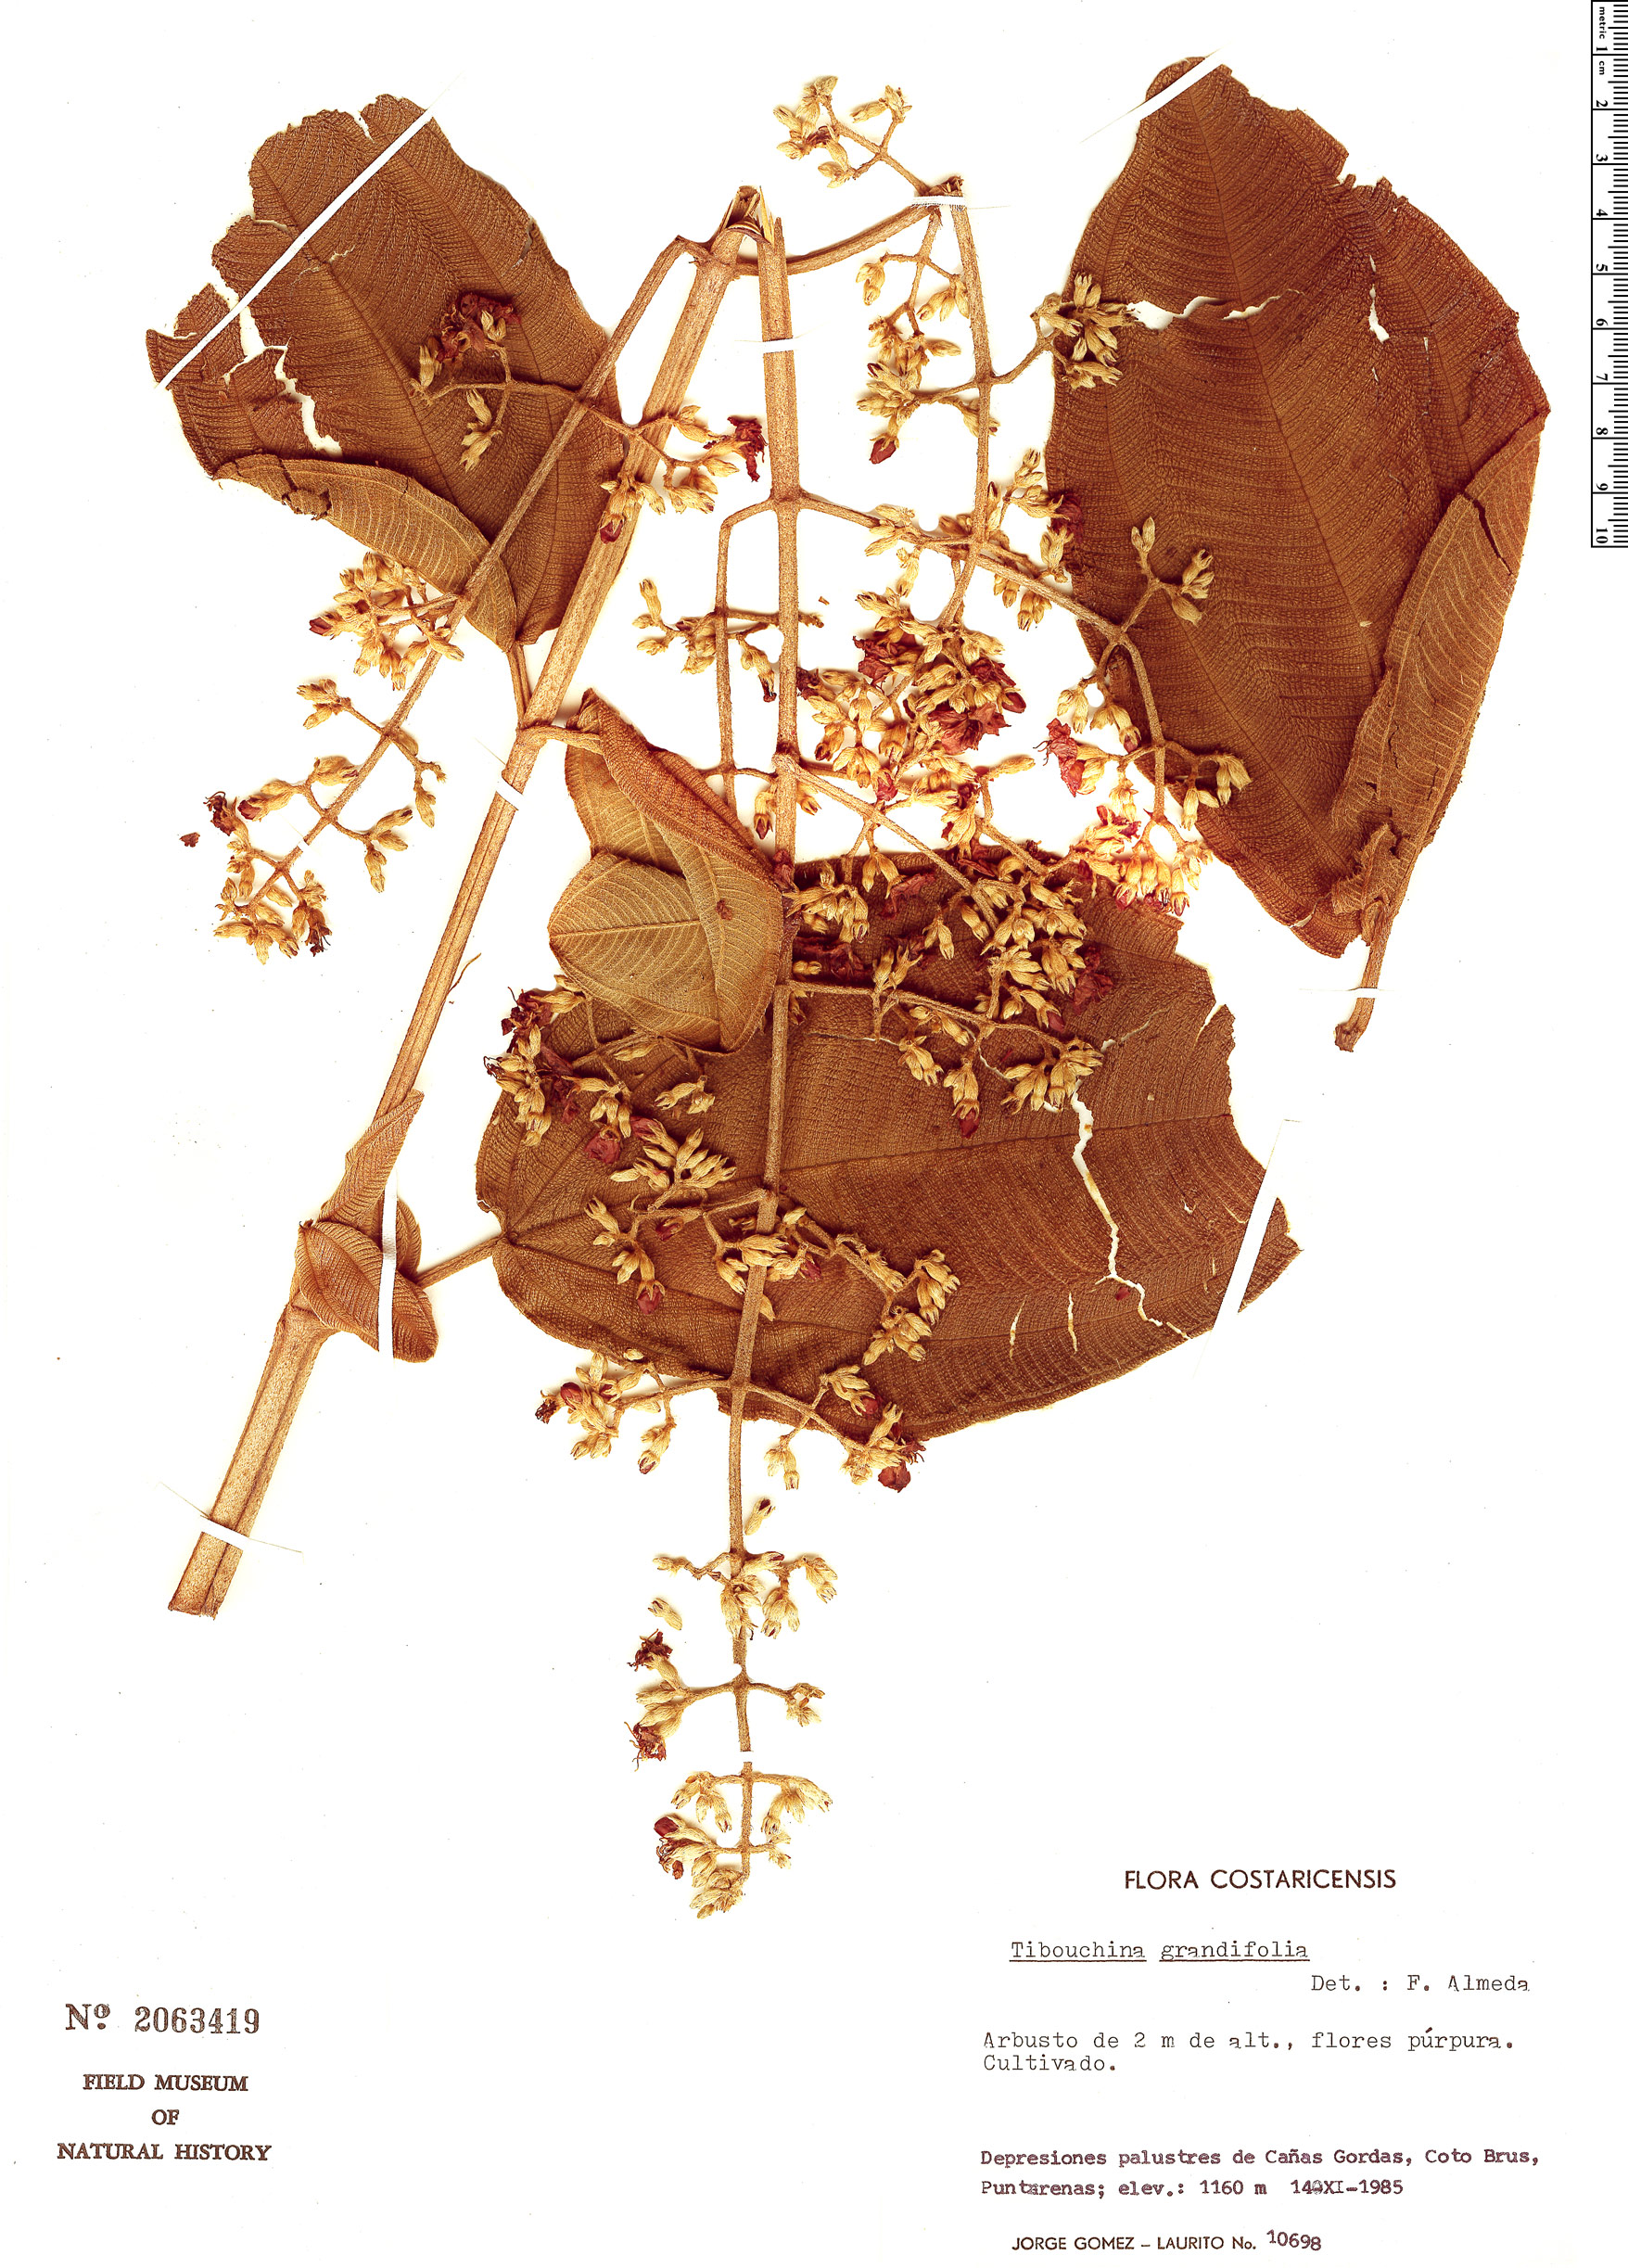 Specimen: Tibouchina grandifolia